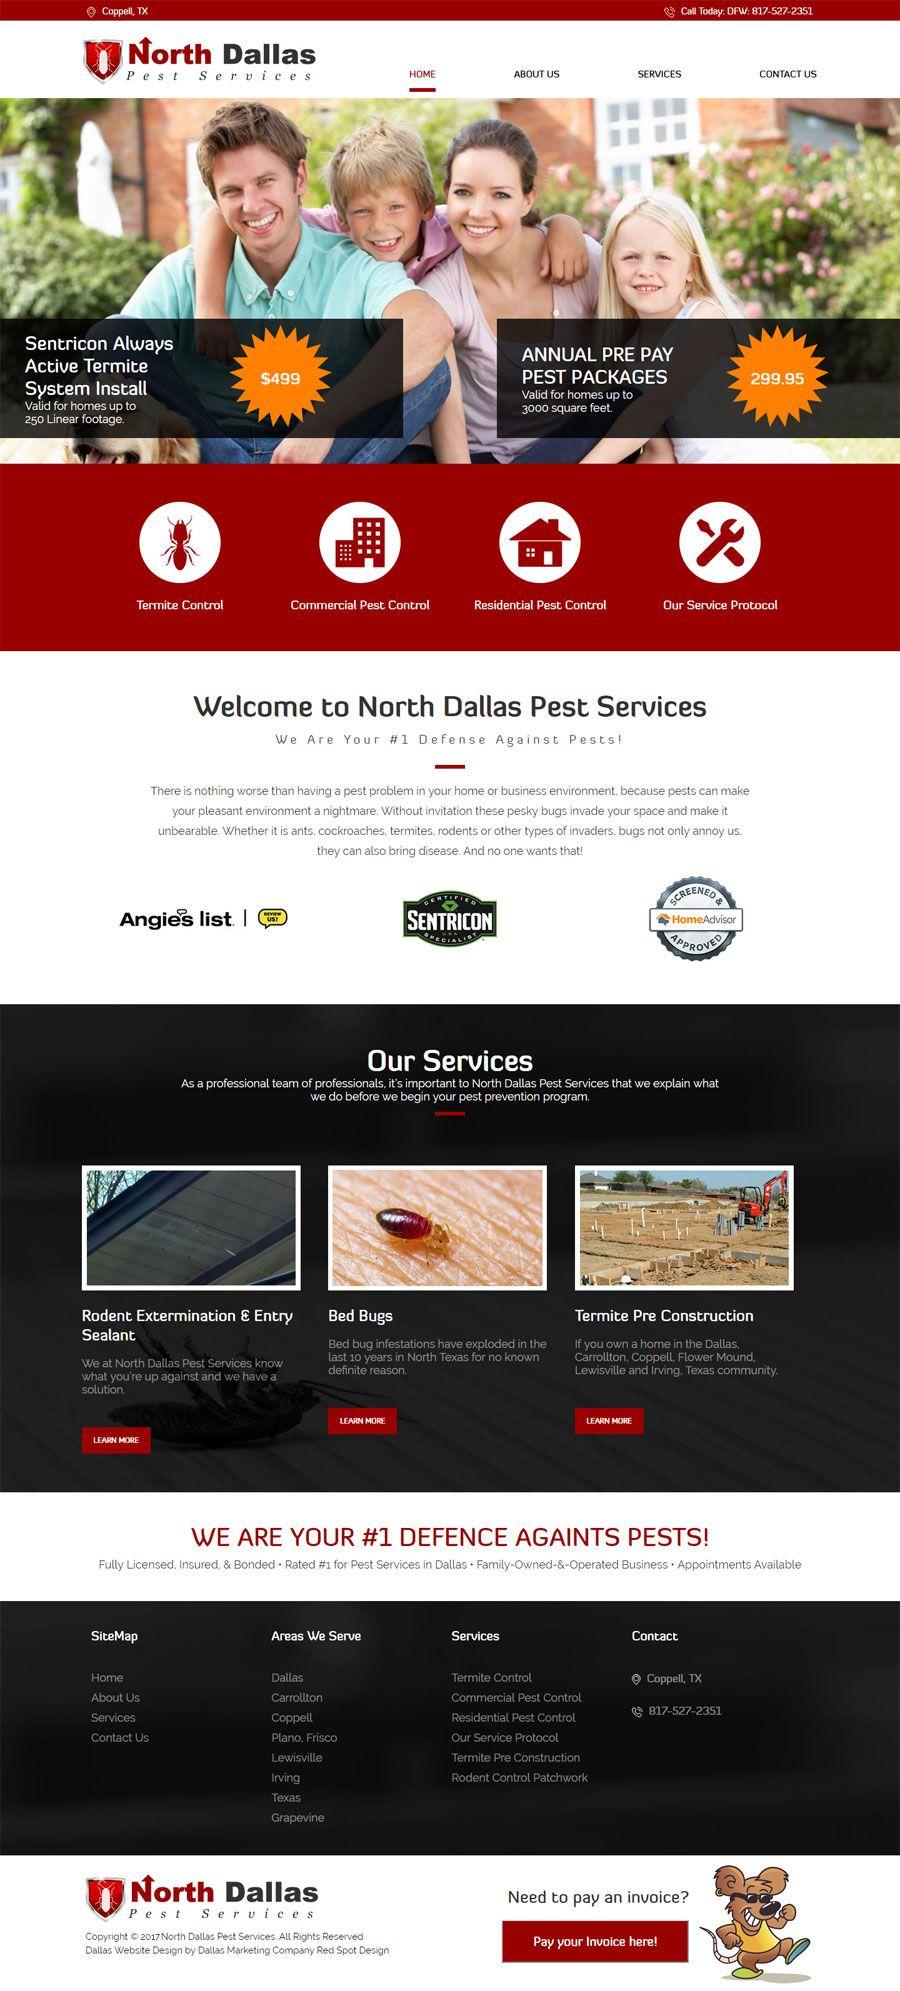 New Web Design For North Dallas Pest Control In Coppell Texas Web Design Web Design Mockup Design Clients